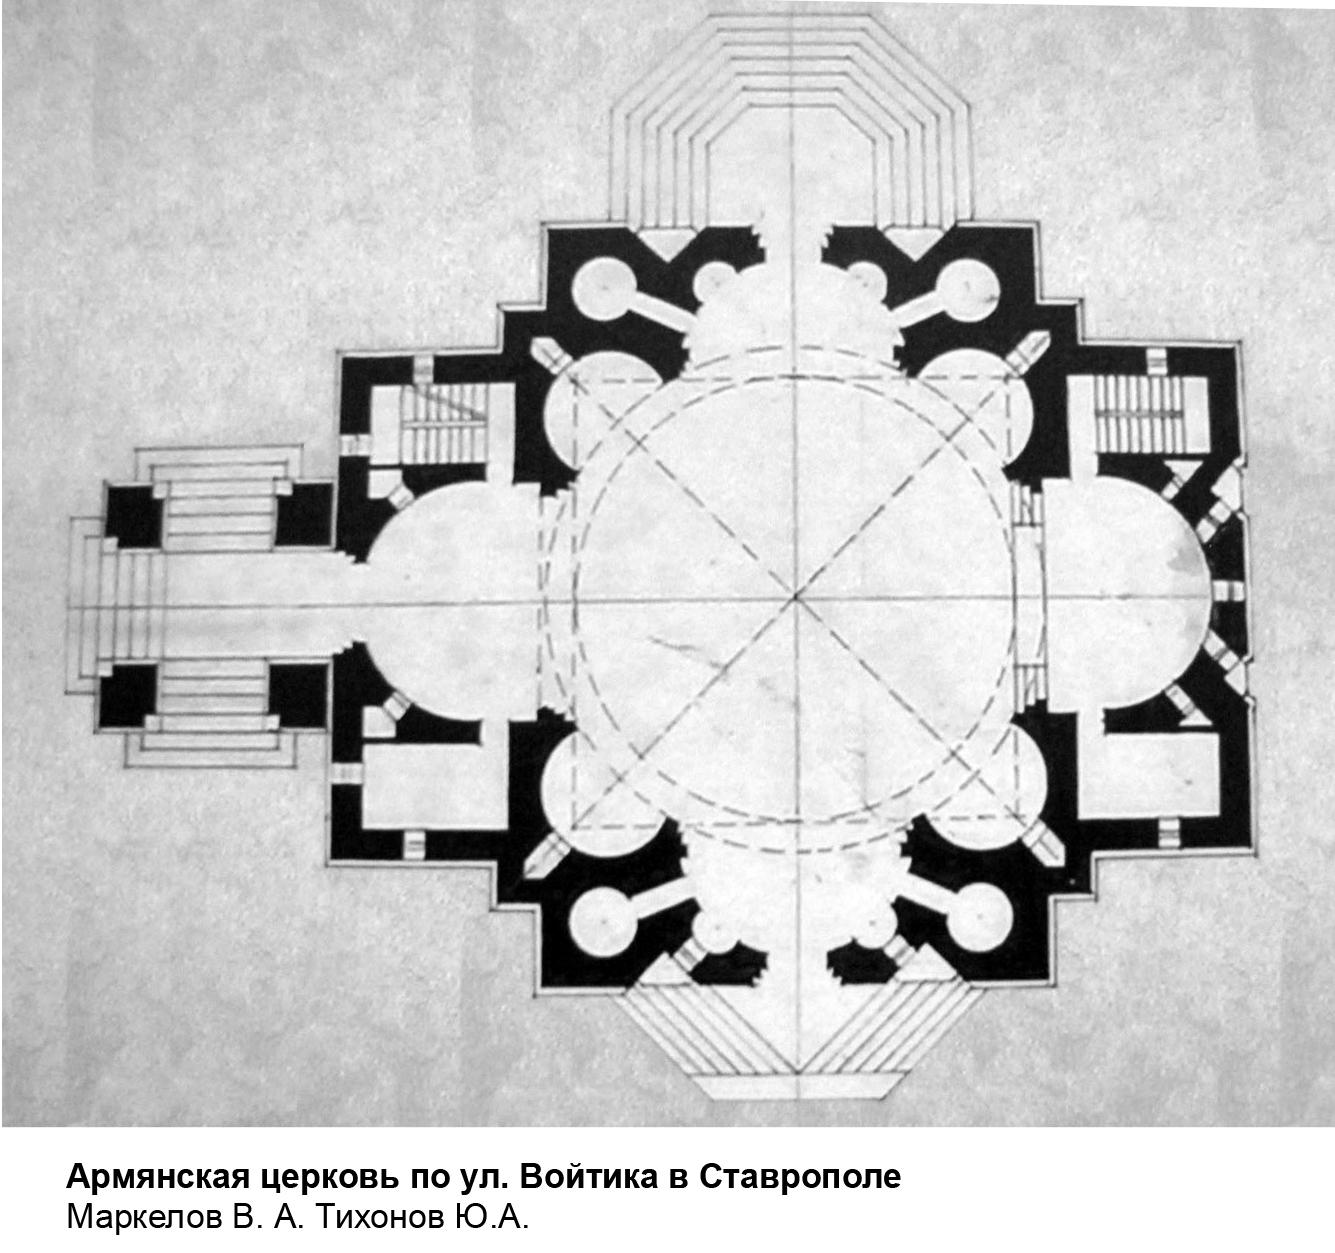 исаакиевский собор схема архитектура чертеж